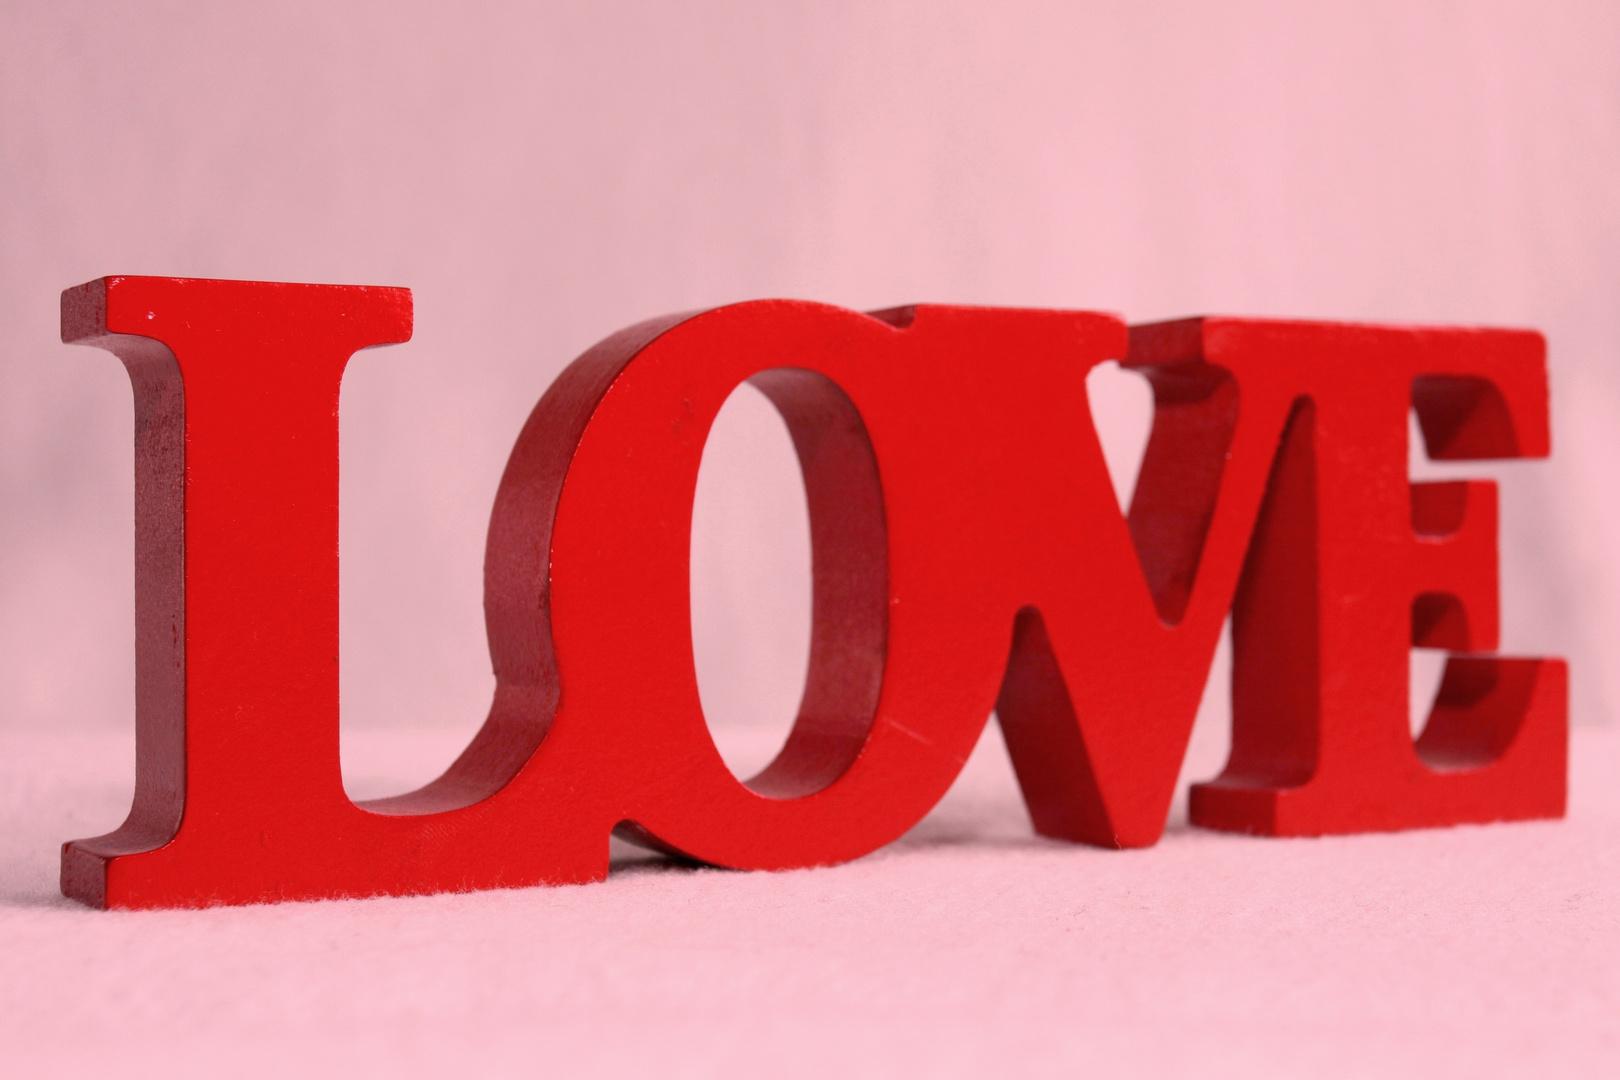 -LOVE-